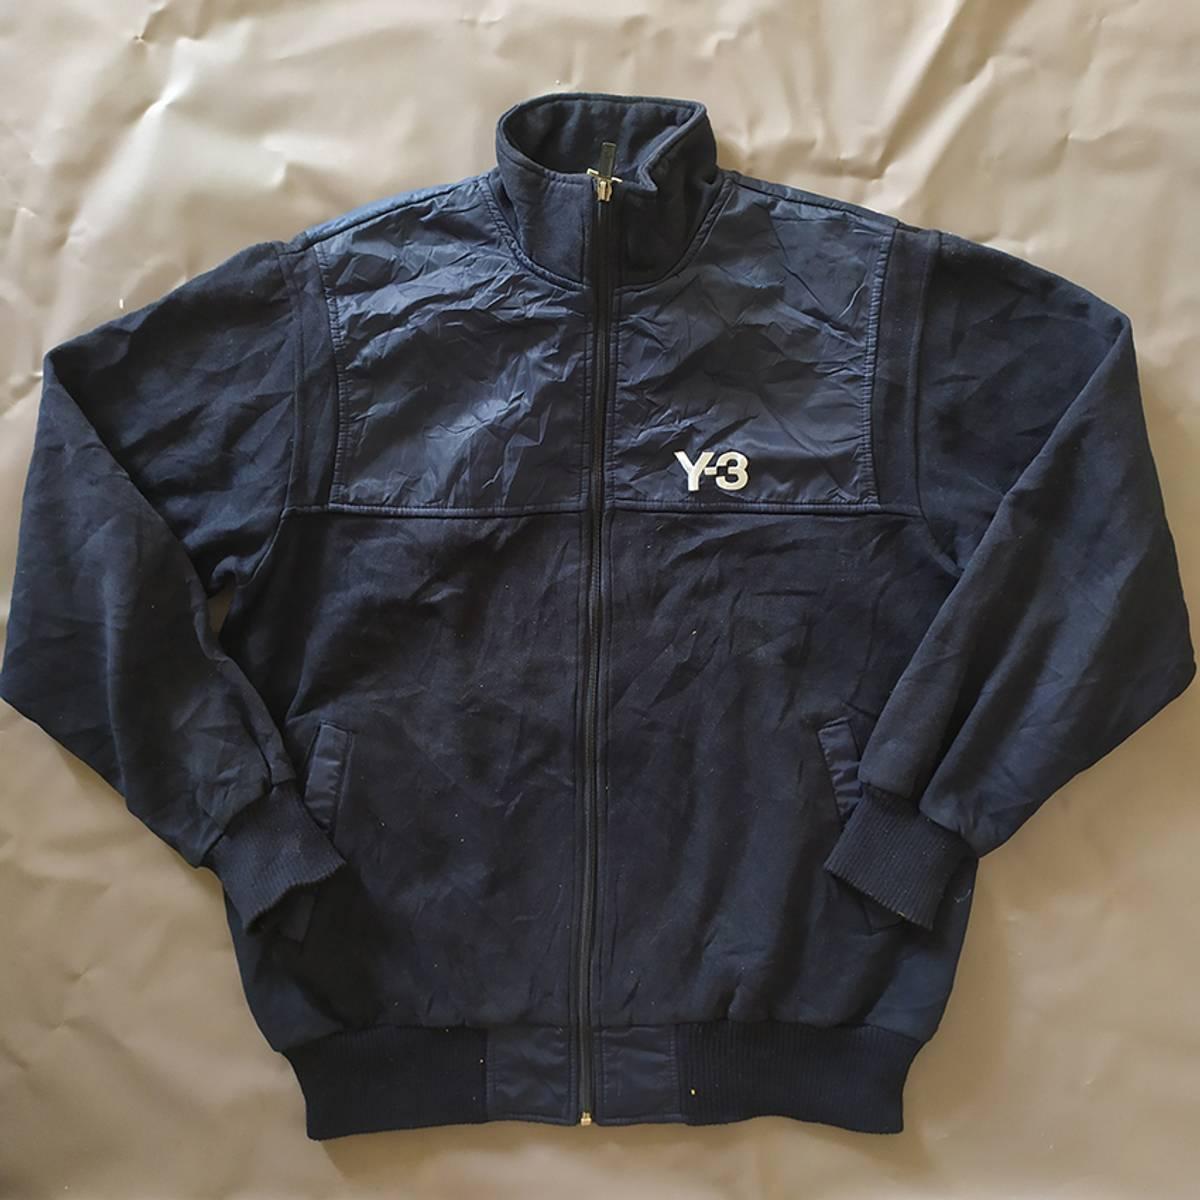 Adidas Vintage Y 3 Yohji Yamamoto Winter Jacket Adidas Y3 Size M Grailed